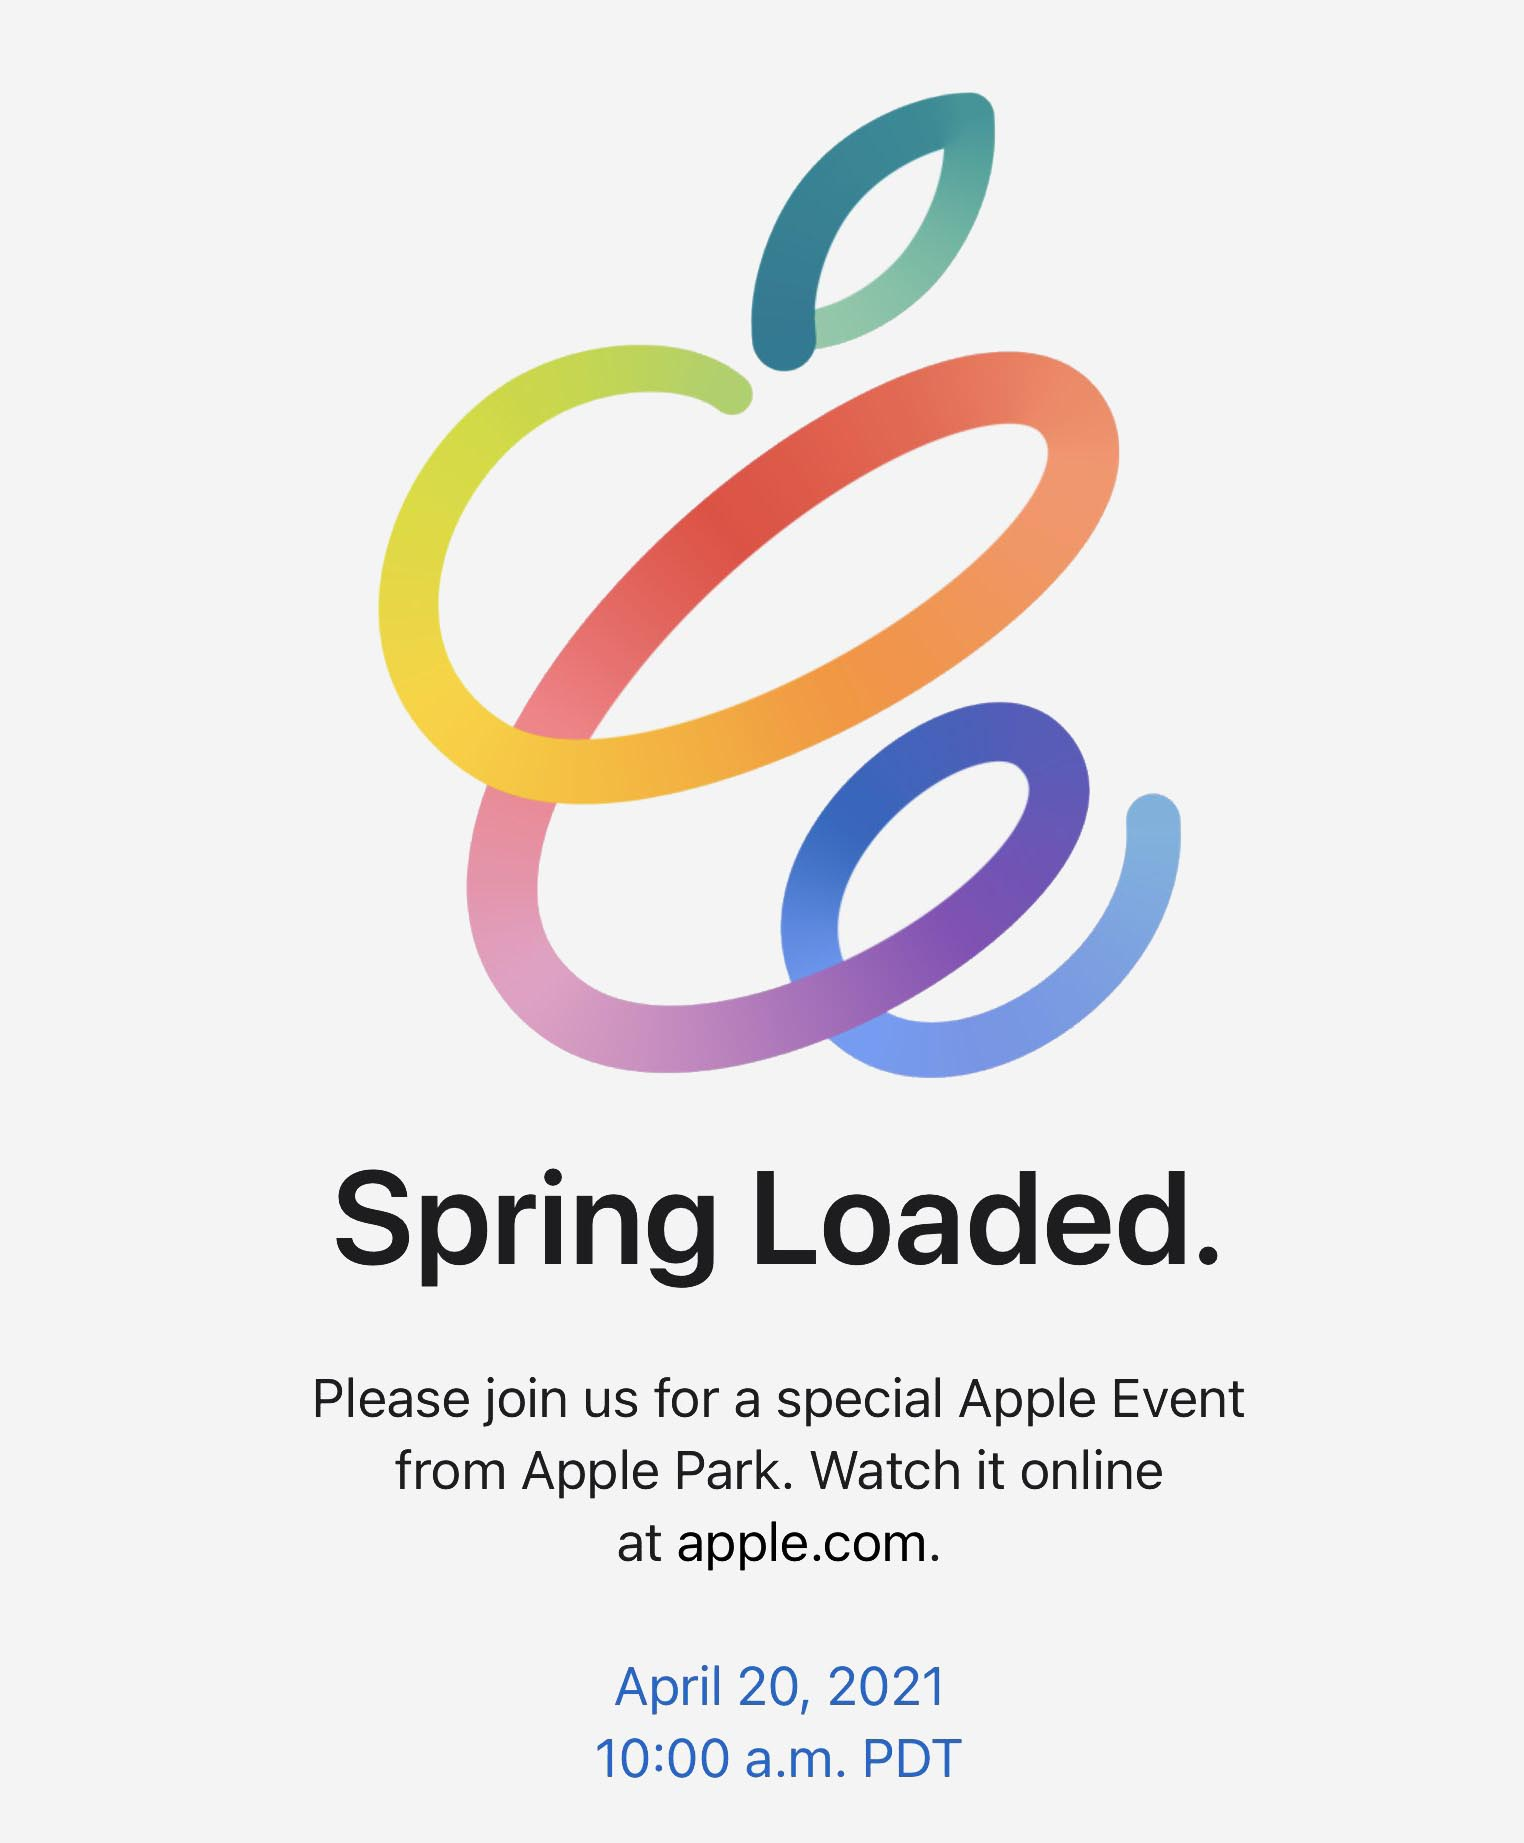 Apple Event avril 2021 Spring Loaded